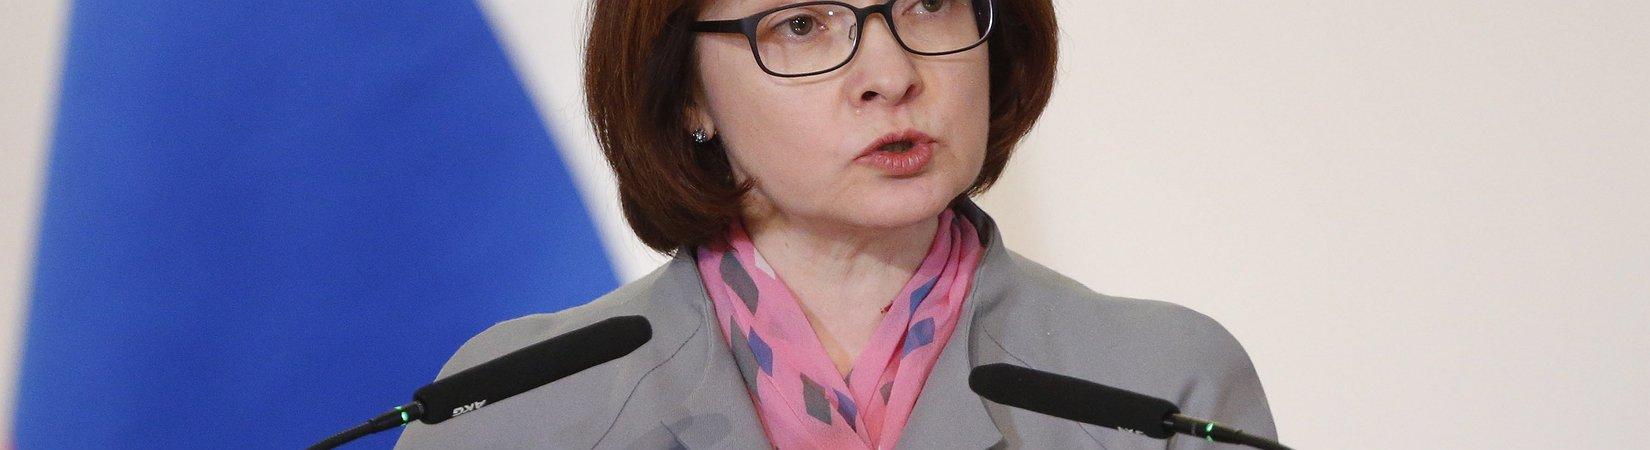 Банк России снизил ключевую ставку до 9%